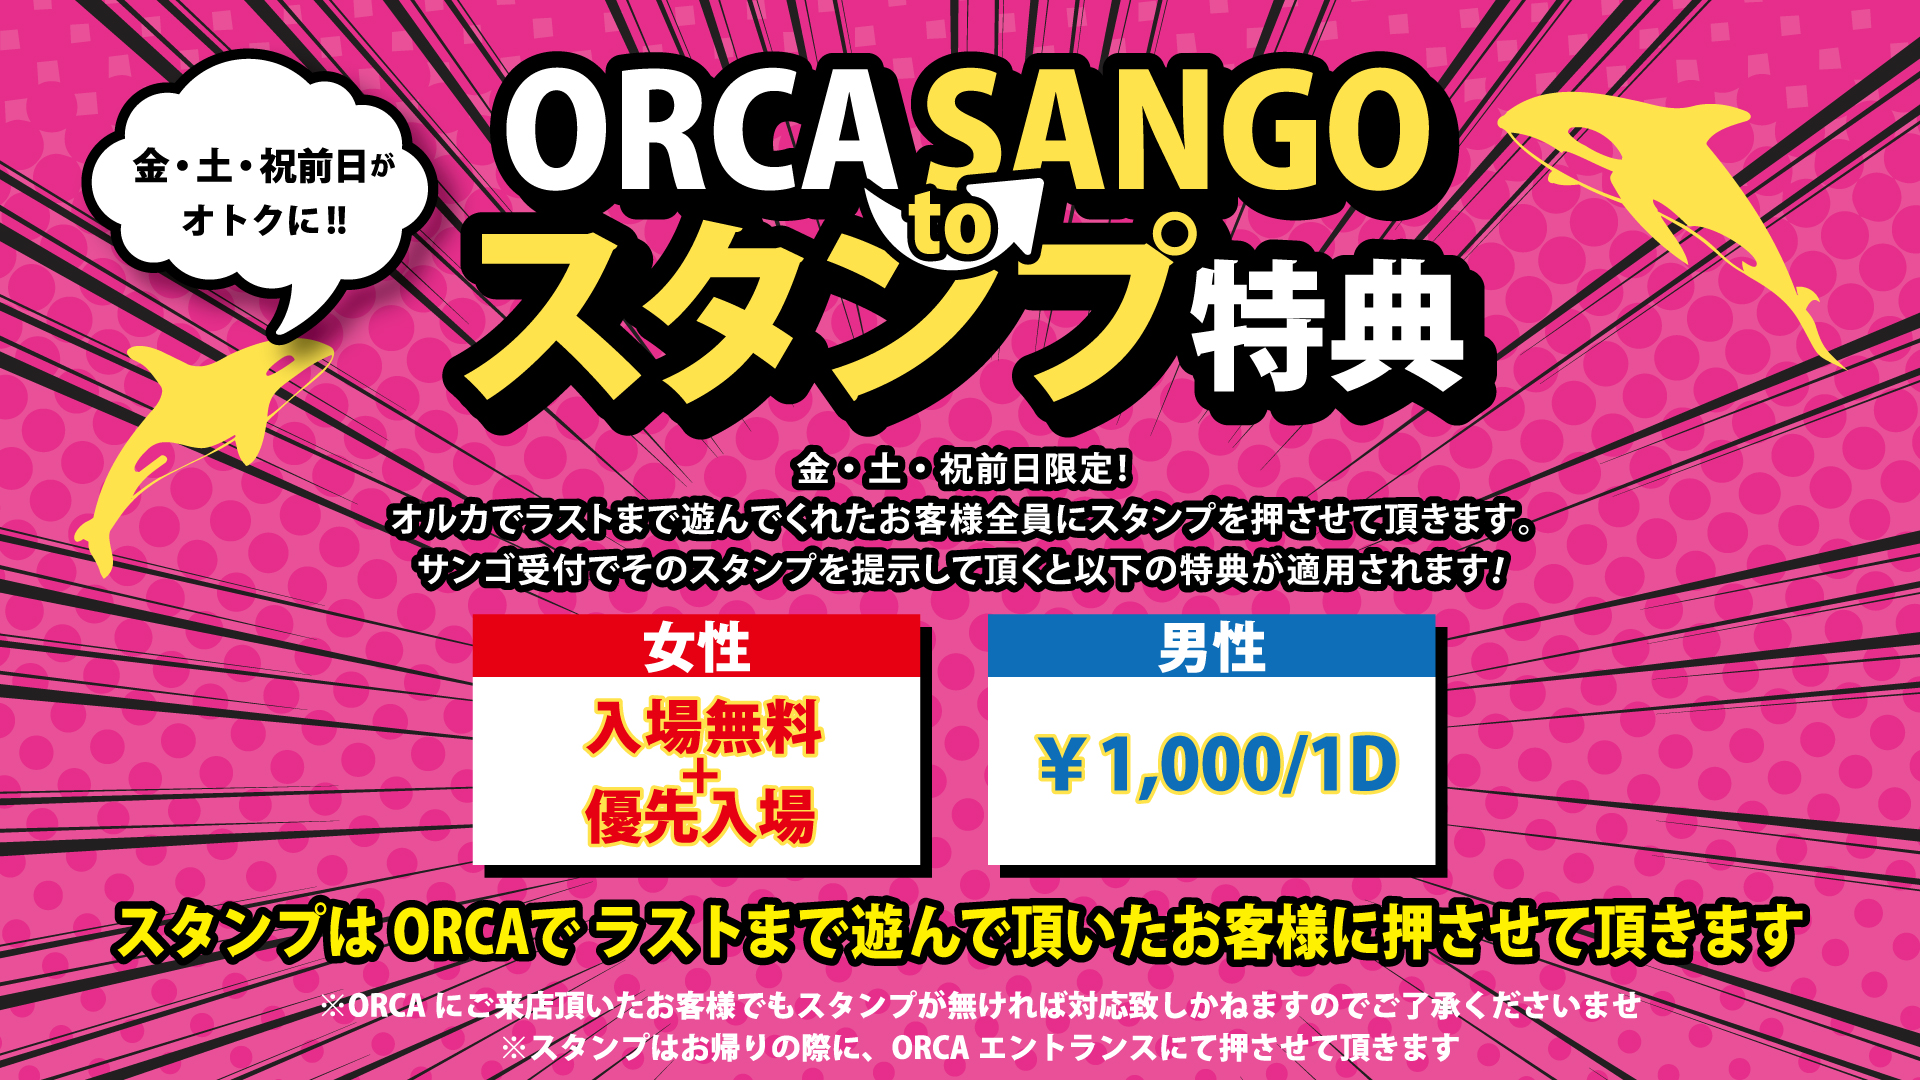 20170625_orcatosango_stamp_1920